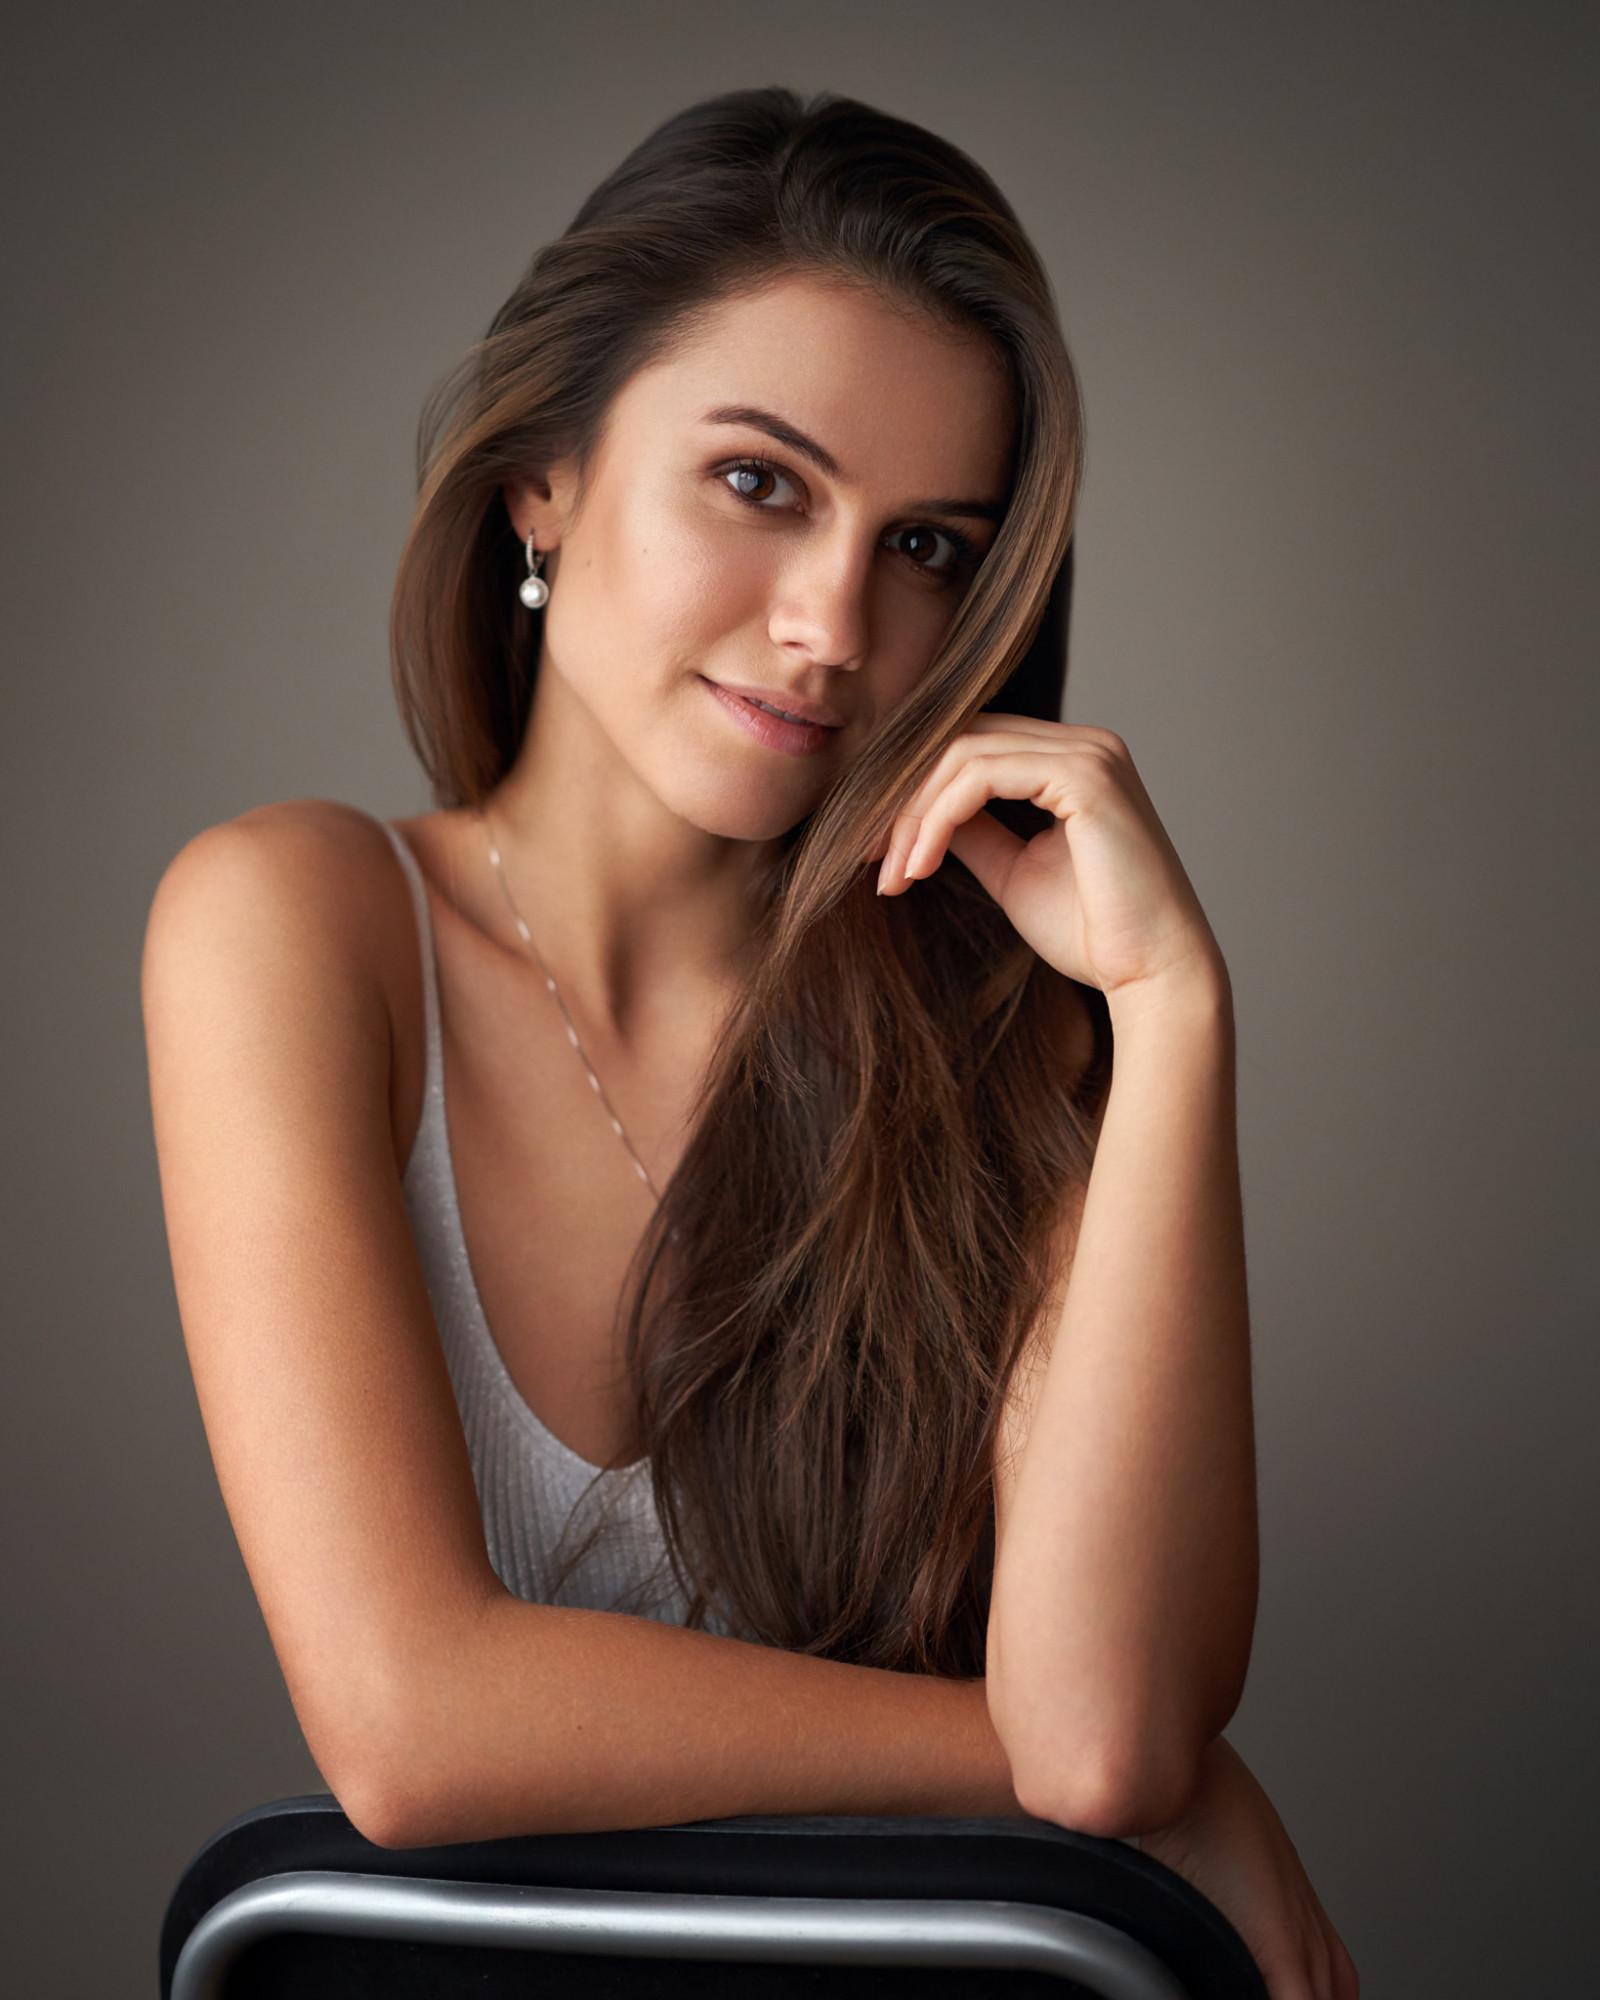 Hintergrundbilder : Frau, Modell-, lange Haare, Brünette